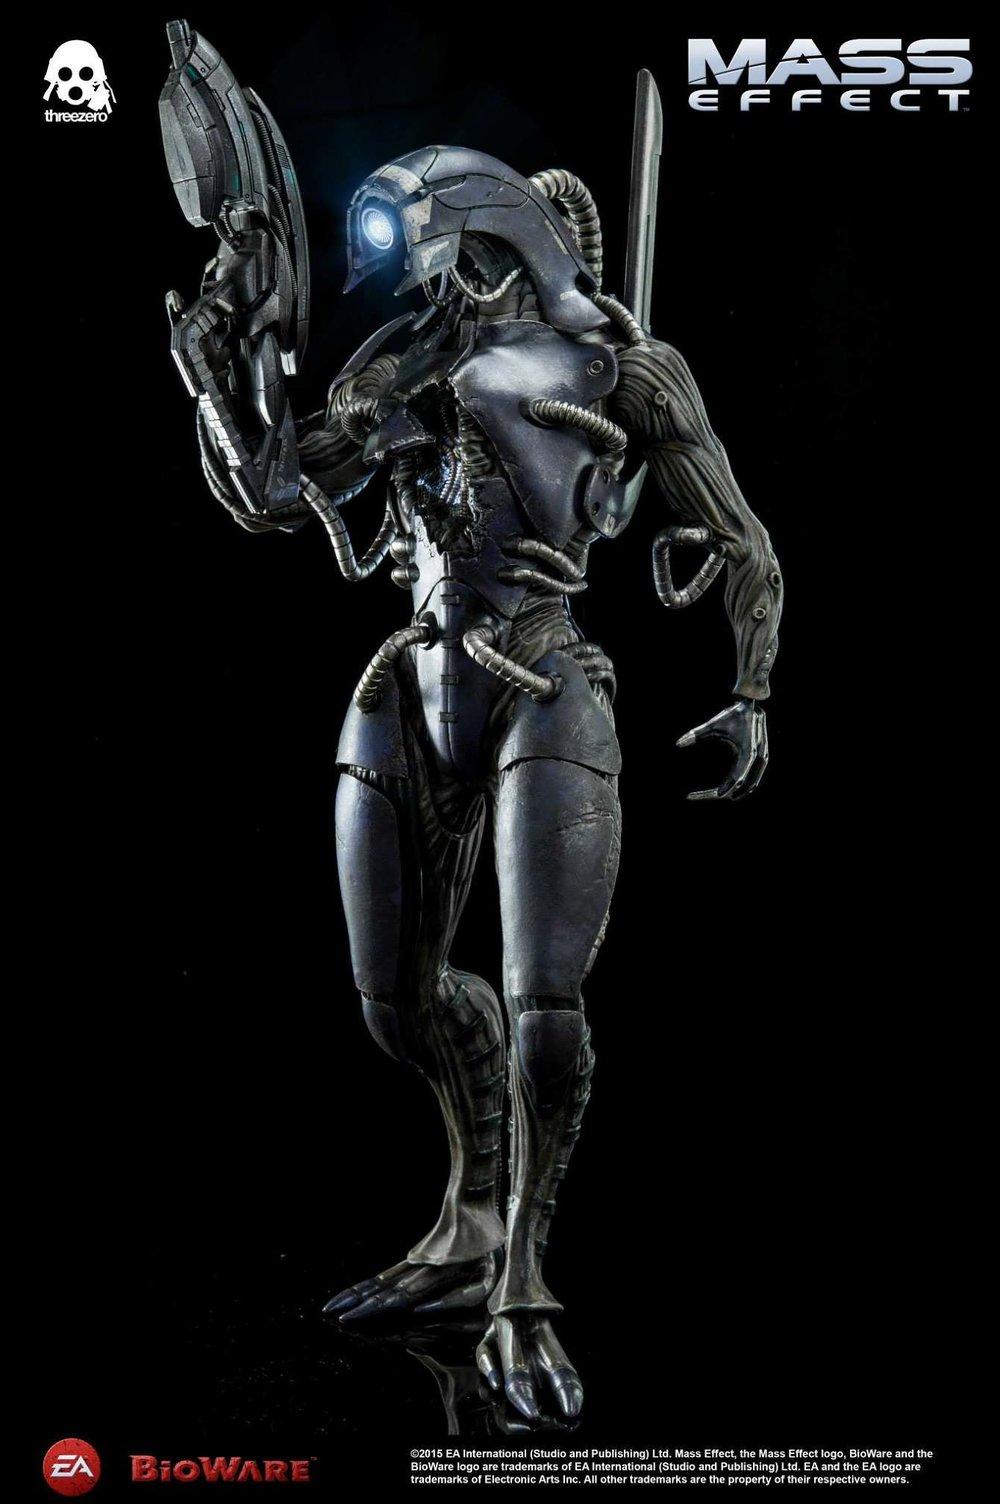 ThreeZero-Bioware-video-game-Legion-Mass-Effect-figure-10_1340_c.jpg